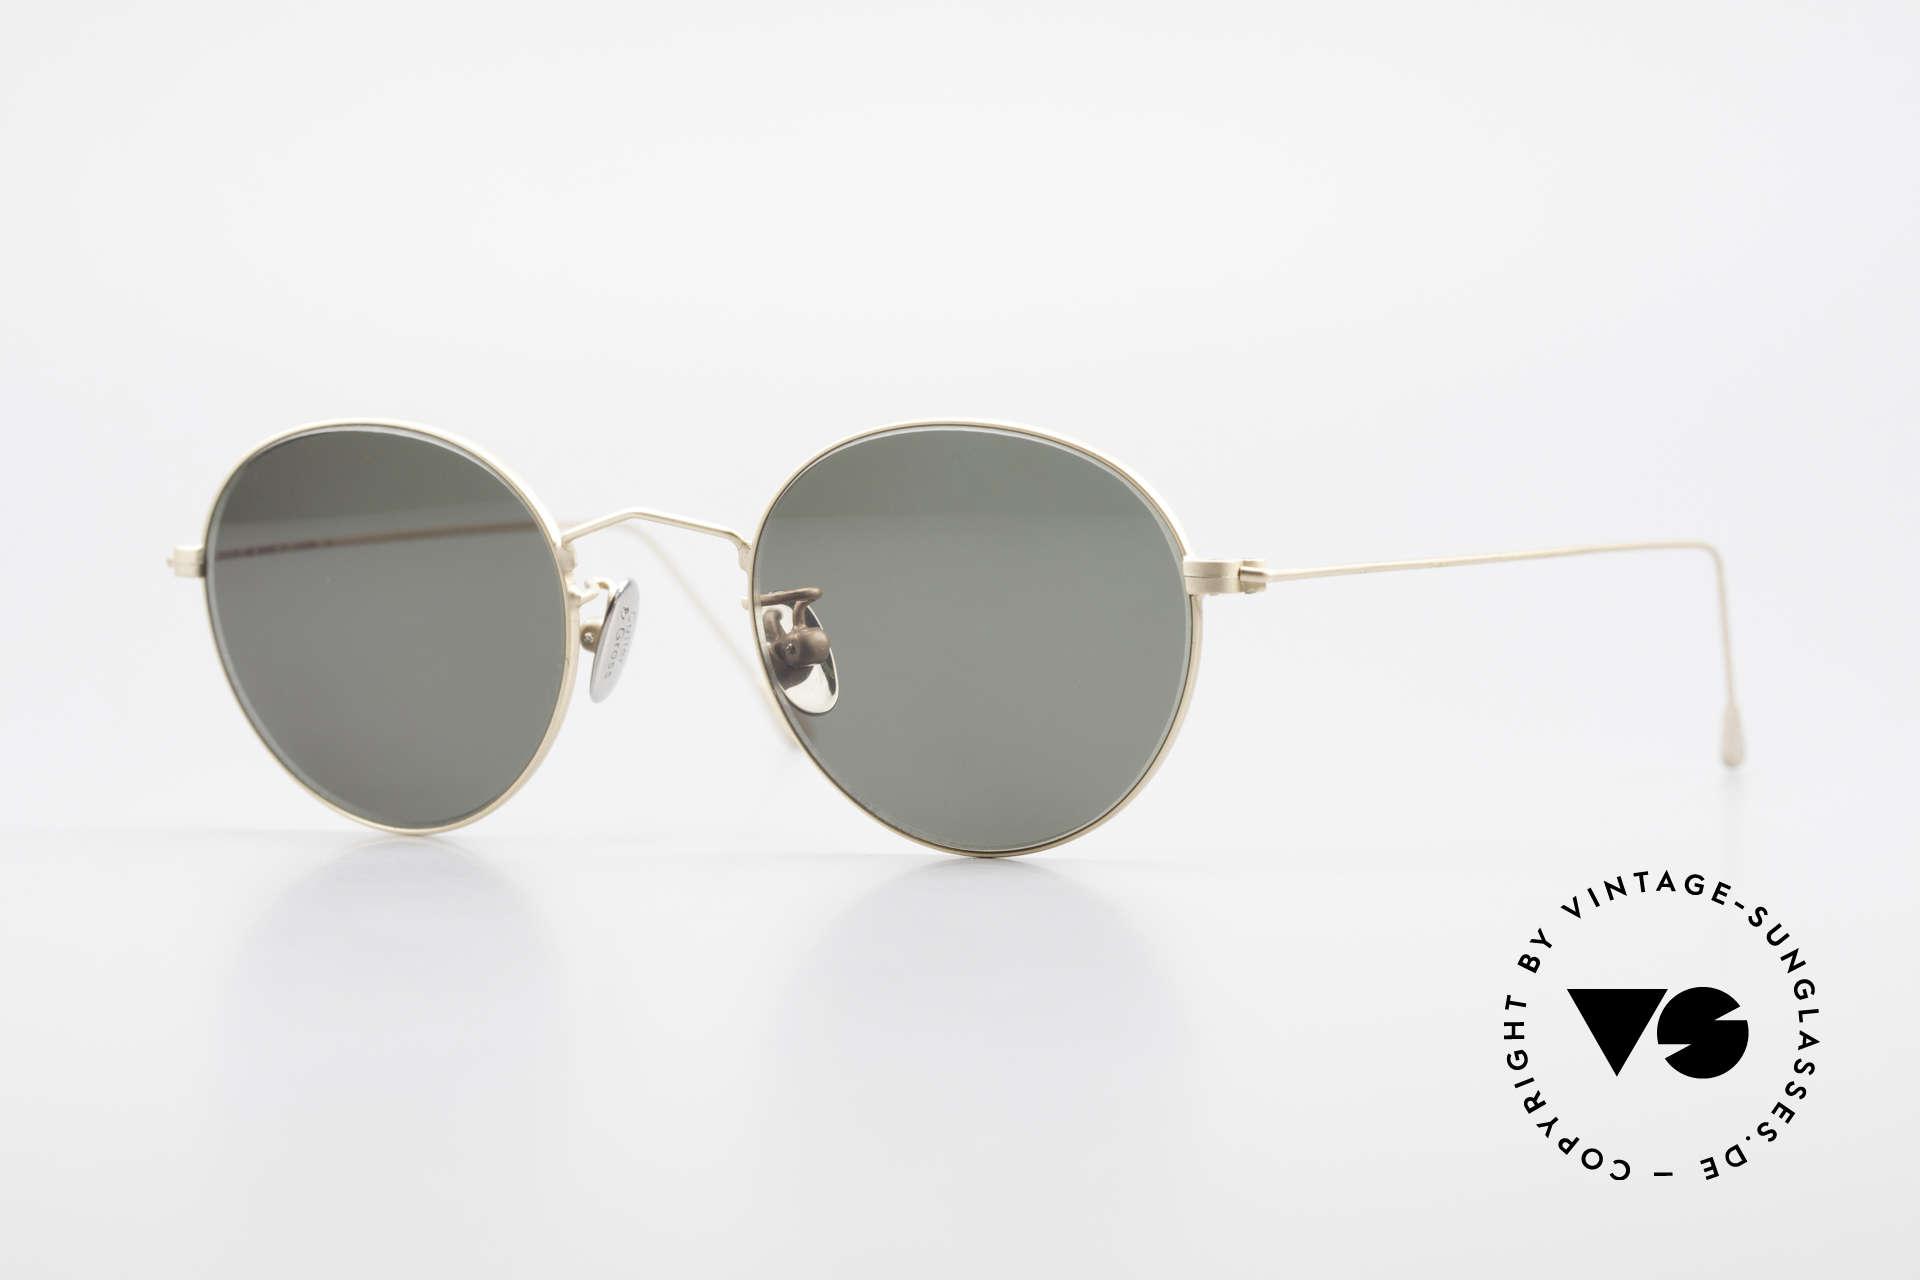 Cutler And Gross 0369 90's Panto Designer Sunglasses, CUTLER and GROSS designer shades from the late 90's, Made for Men and Women